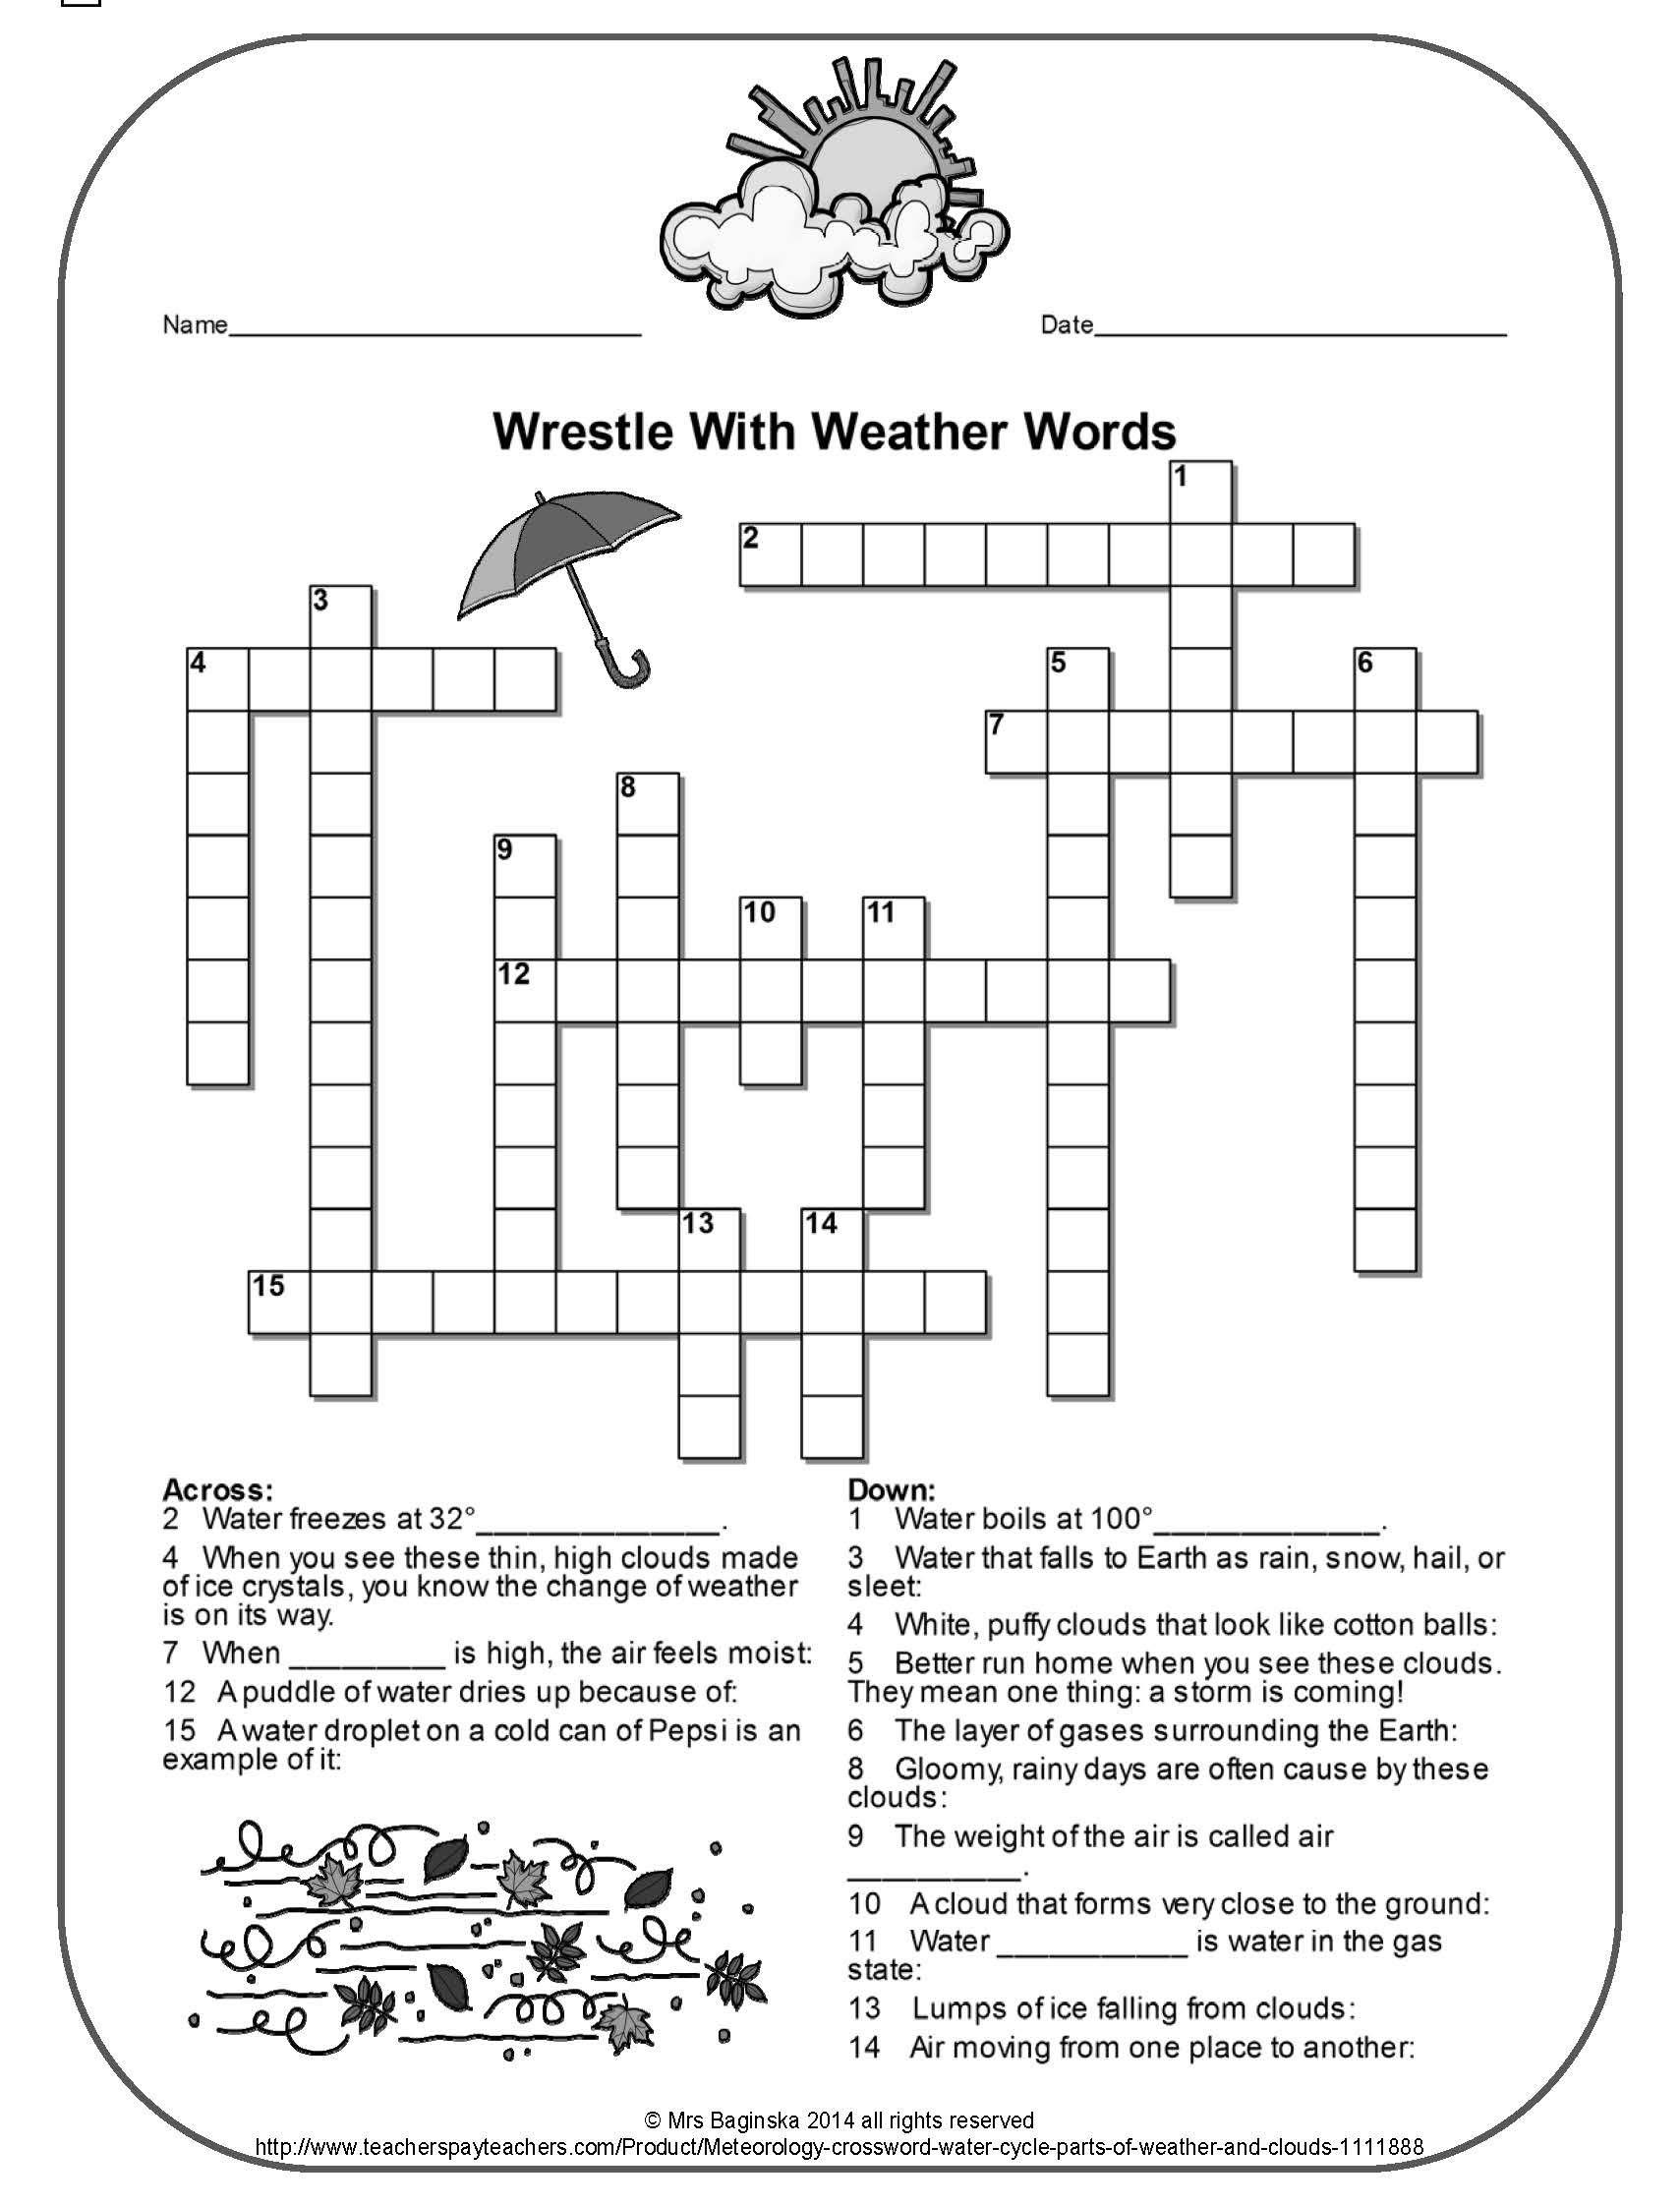 Pina Demanding 4Th Grade Teacher On Fun Stuff For Primary Grades - 4Th Grade Printable Crossword Puzzles